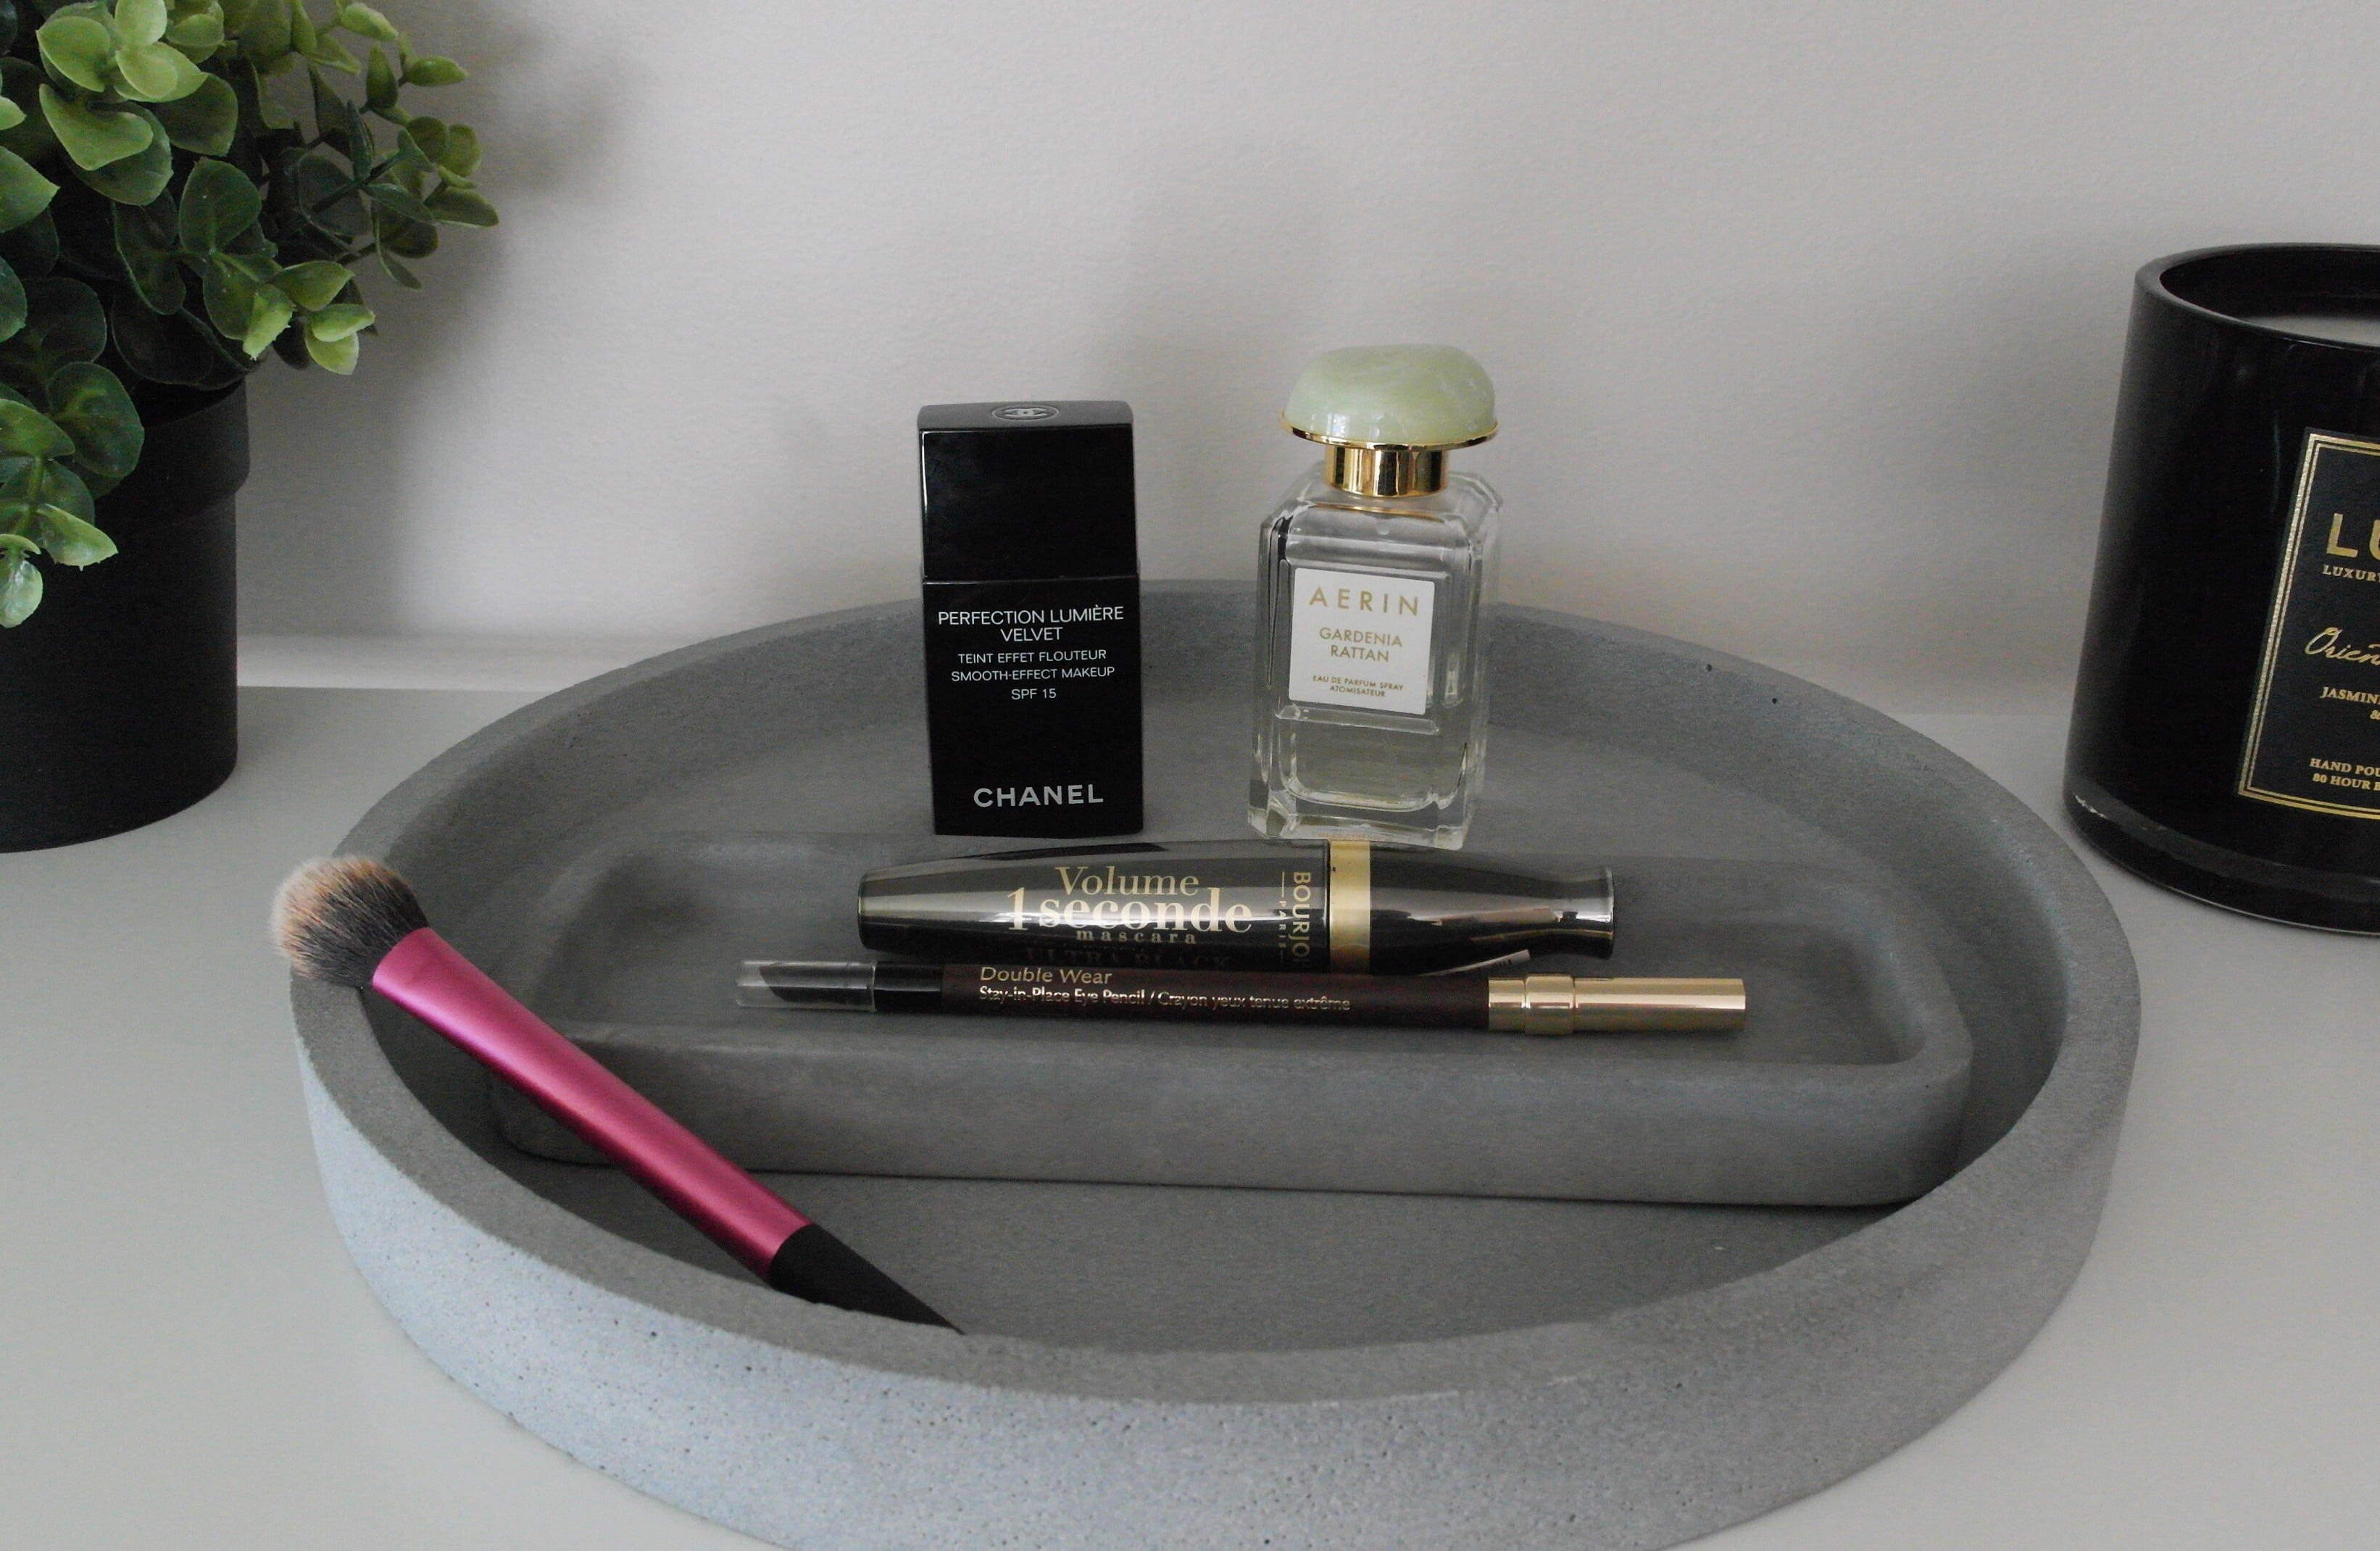 Chanel Perfection Lumiere Velvet, Aerin Gardenia Rattan, Bourjois 1 Second Volume Mascara, Estée Lauder Double Wear Eyeliner, Real Techniques Setting Brush